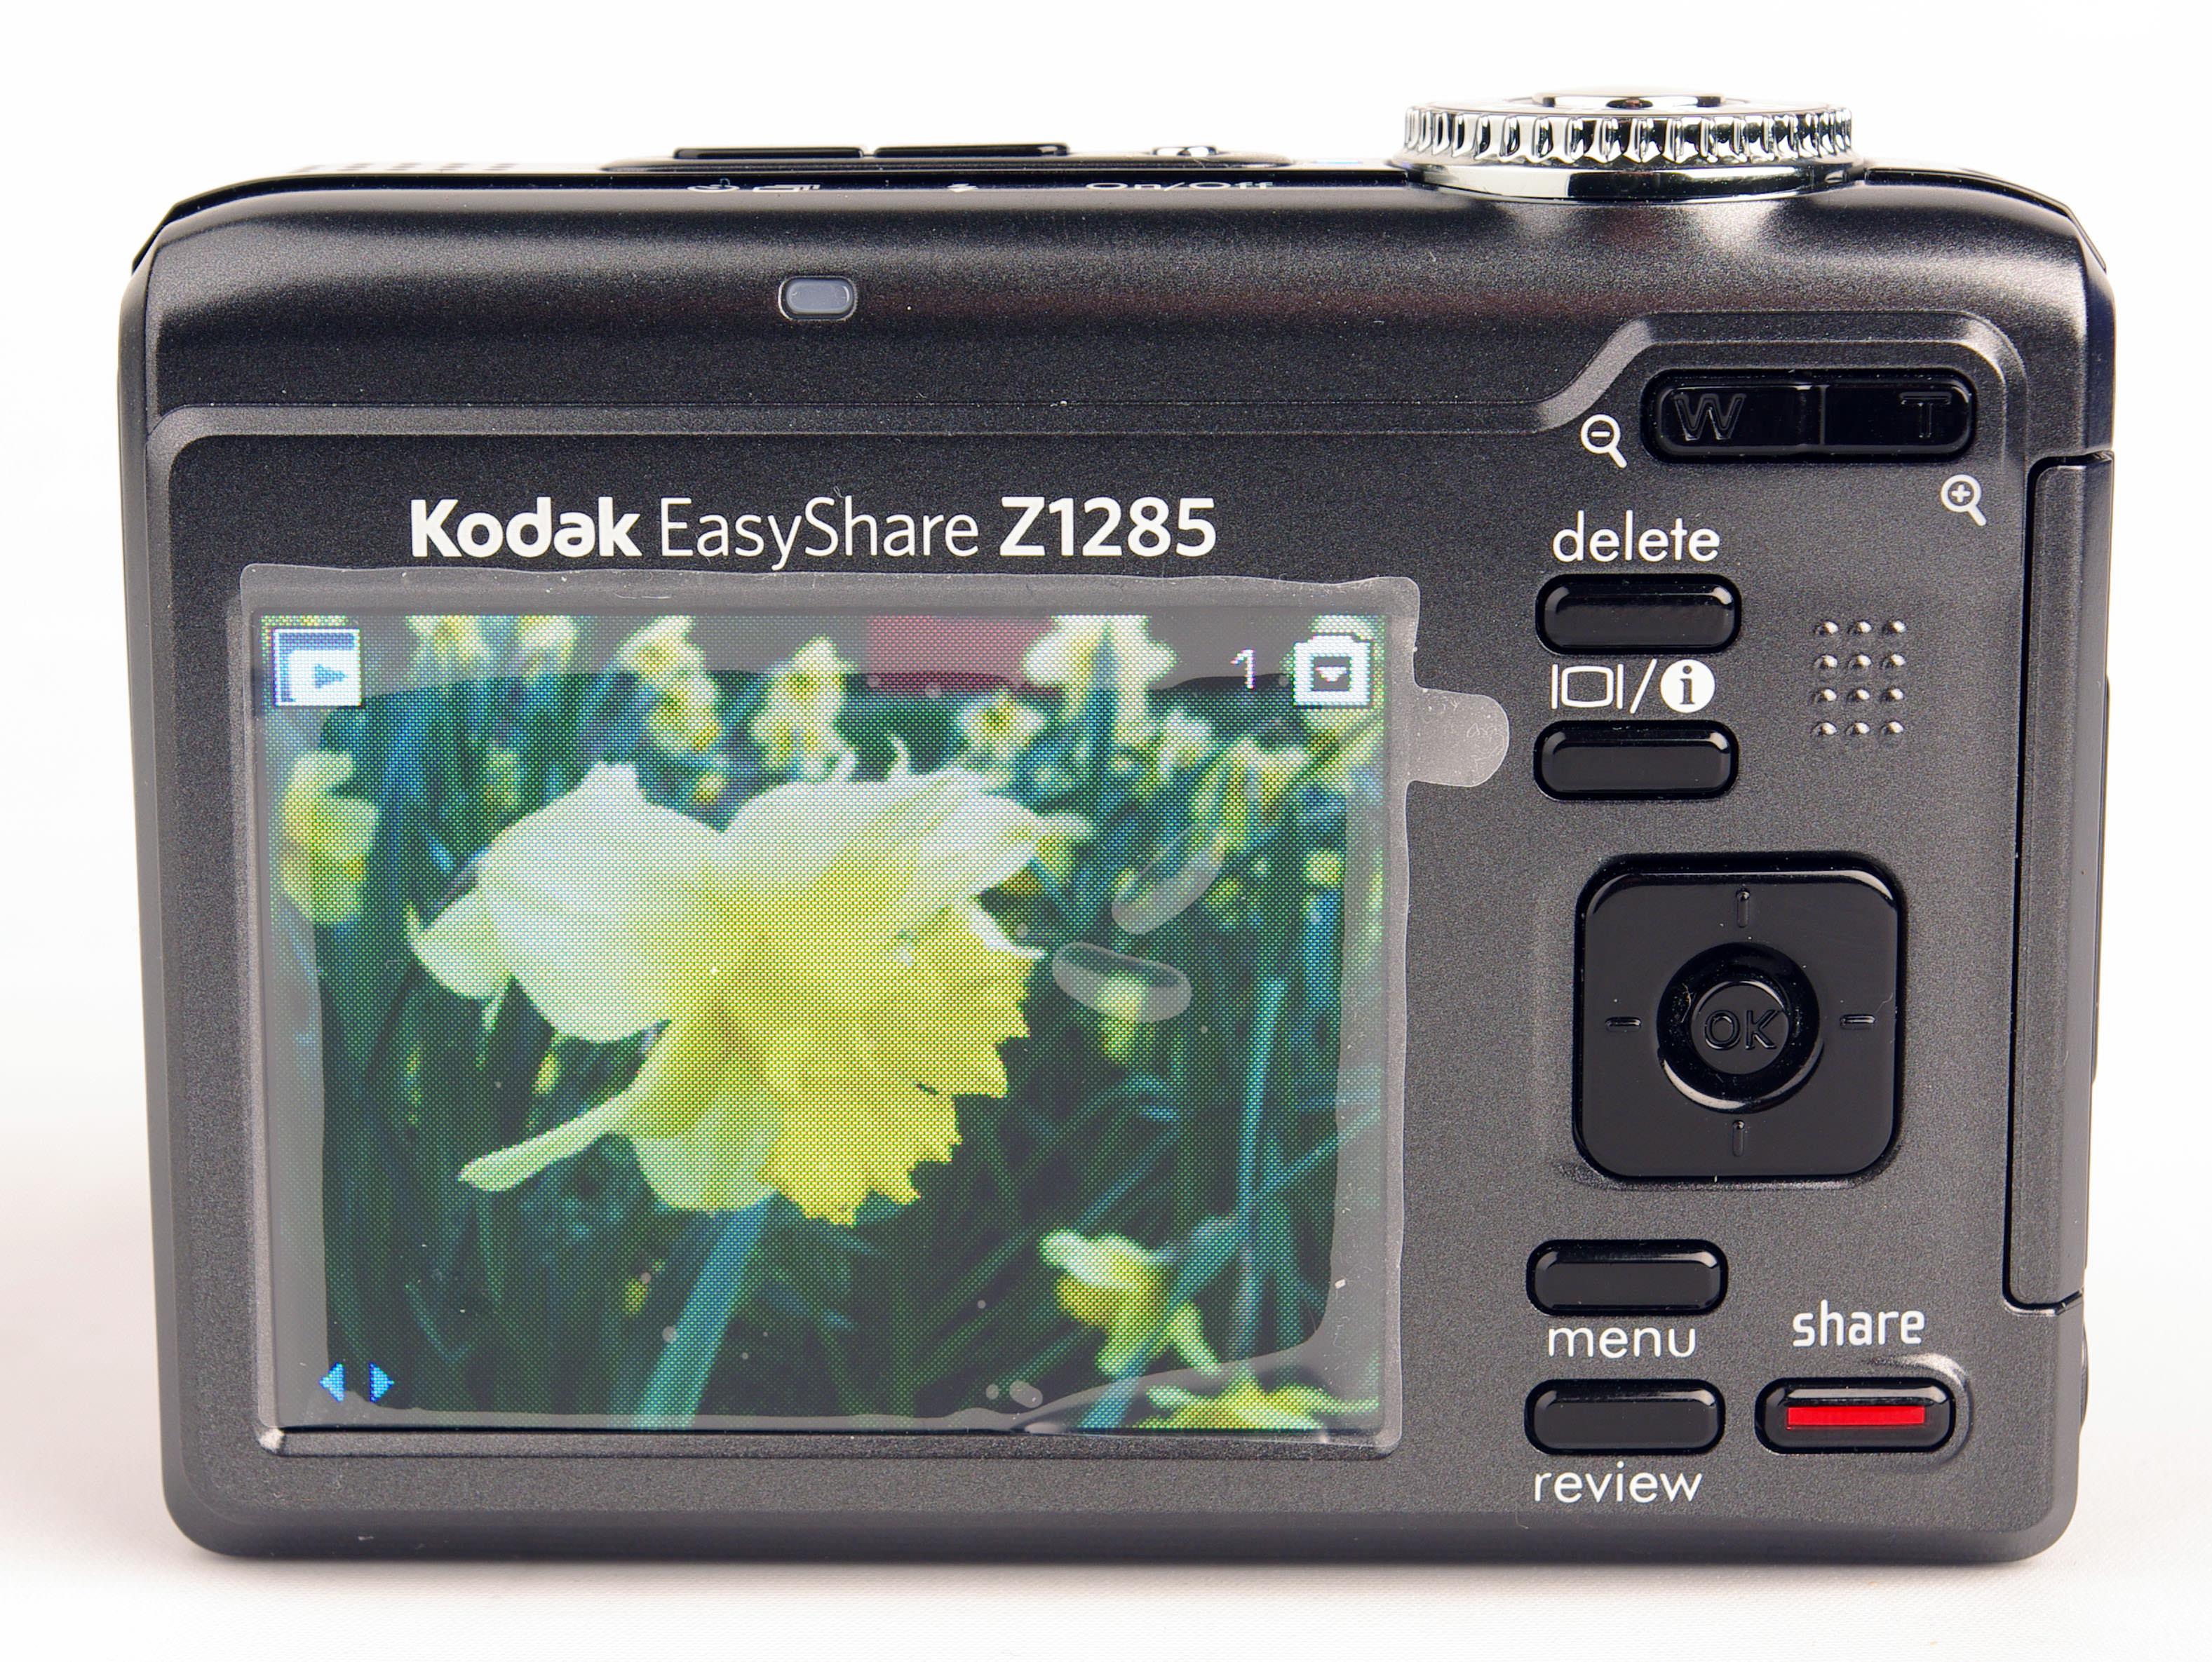 kodak easyshare z1285 digital camera review rh ephotozine com Kodak EasyShare Software Kodak EasyShare Software